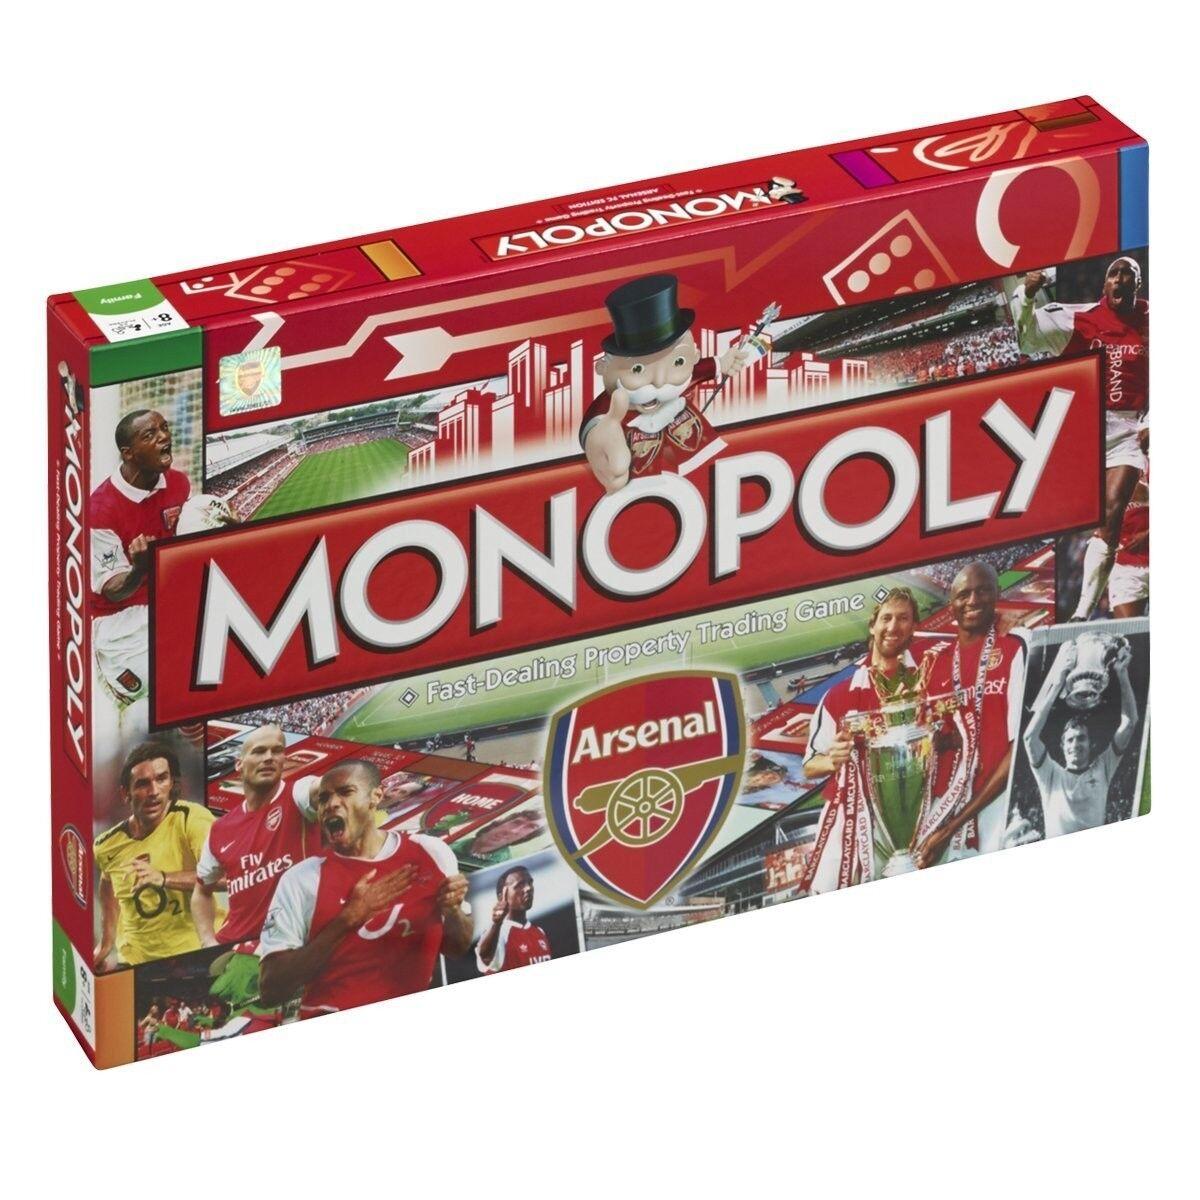 Monopoly Arsenal Football Football Club Game Game Game Board Game Board Game Englisch 946c6d